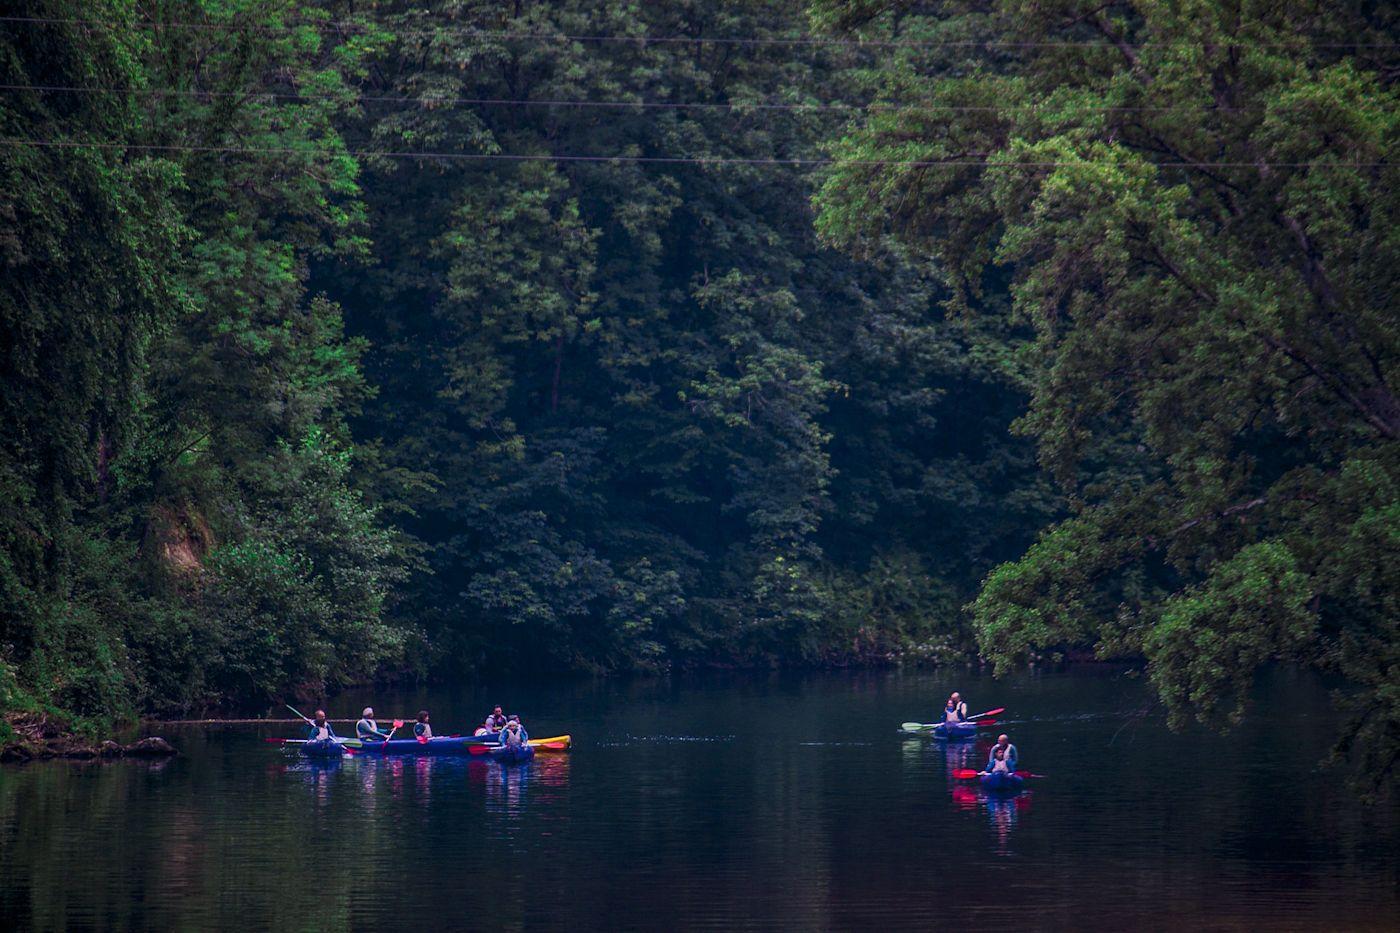 Descenso del Sella en canoa - Frontera Verde Aventura